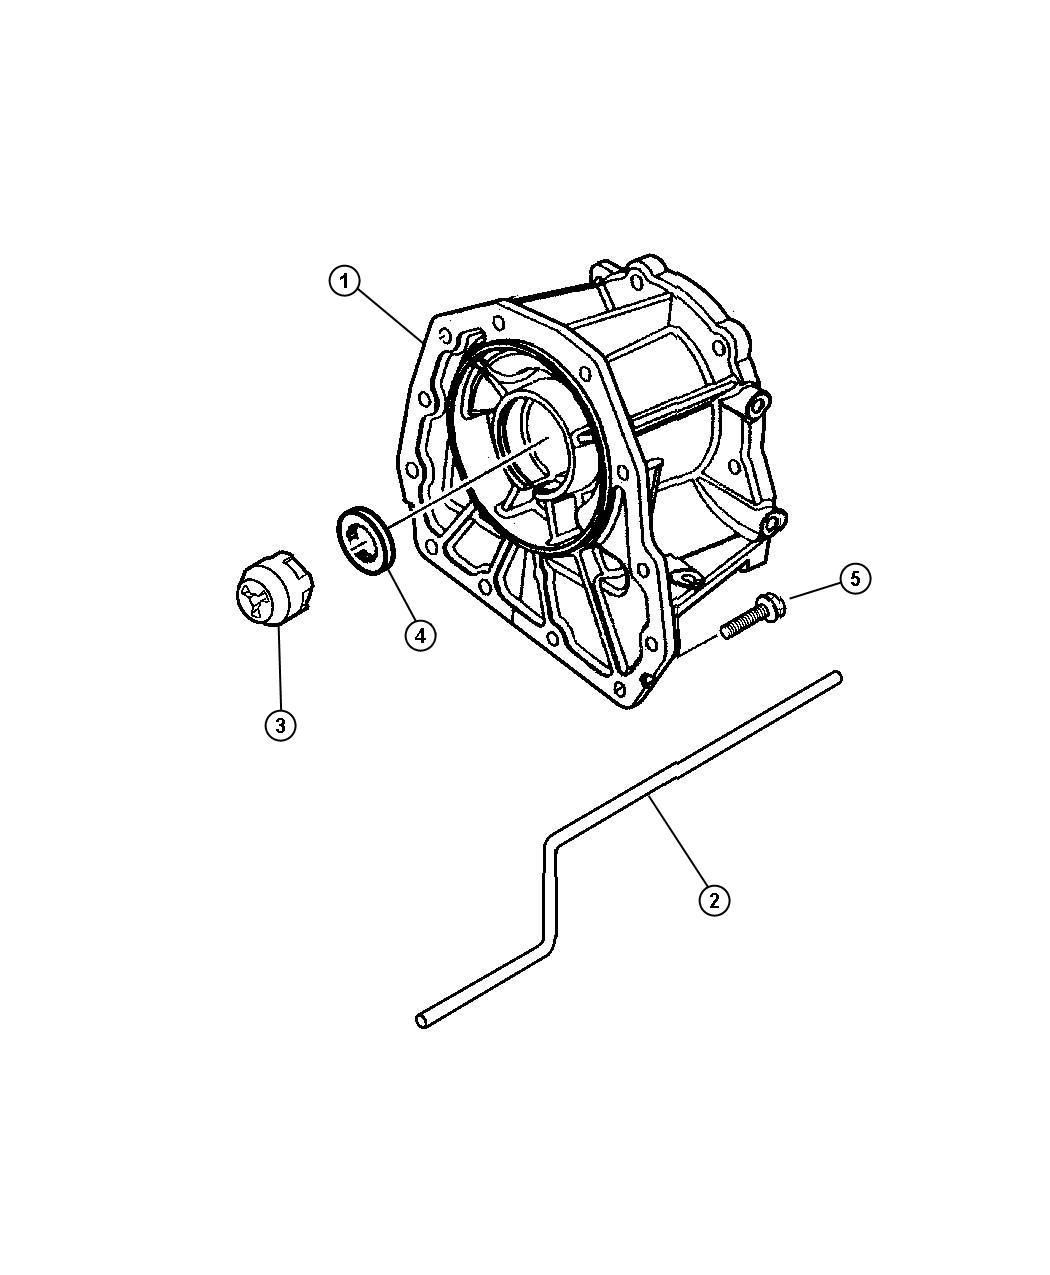 Dodge Dakota Adapter Transfer Case Transmission Spd